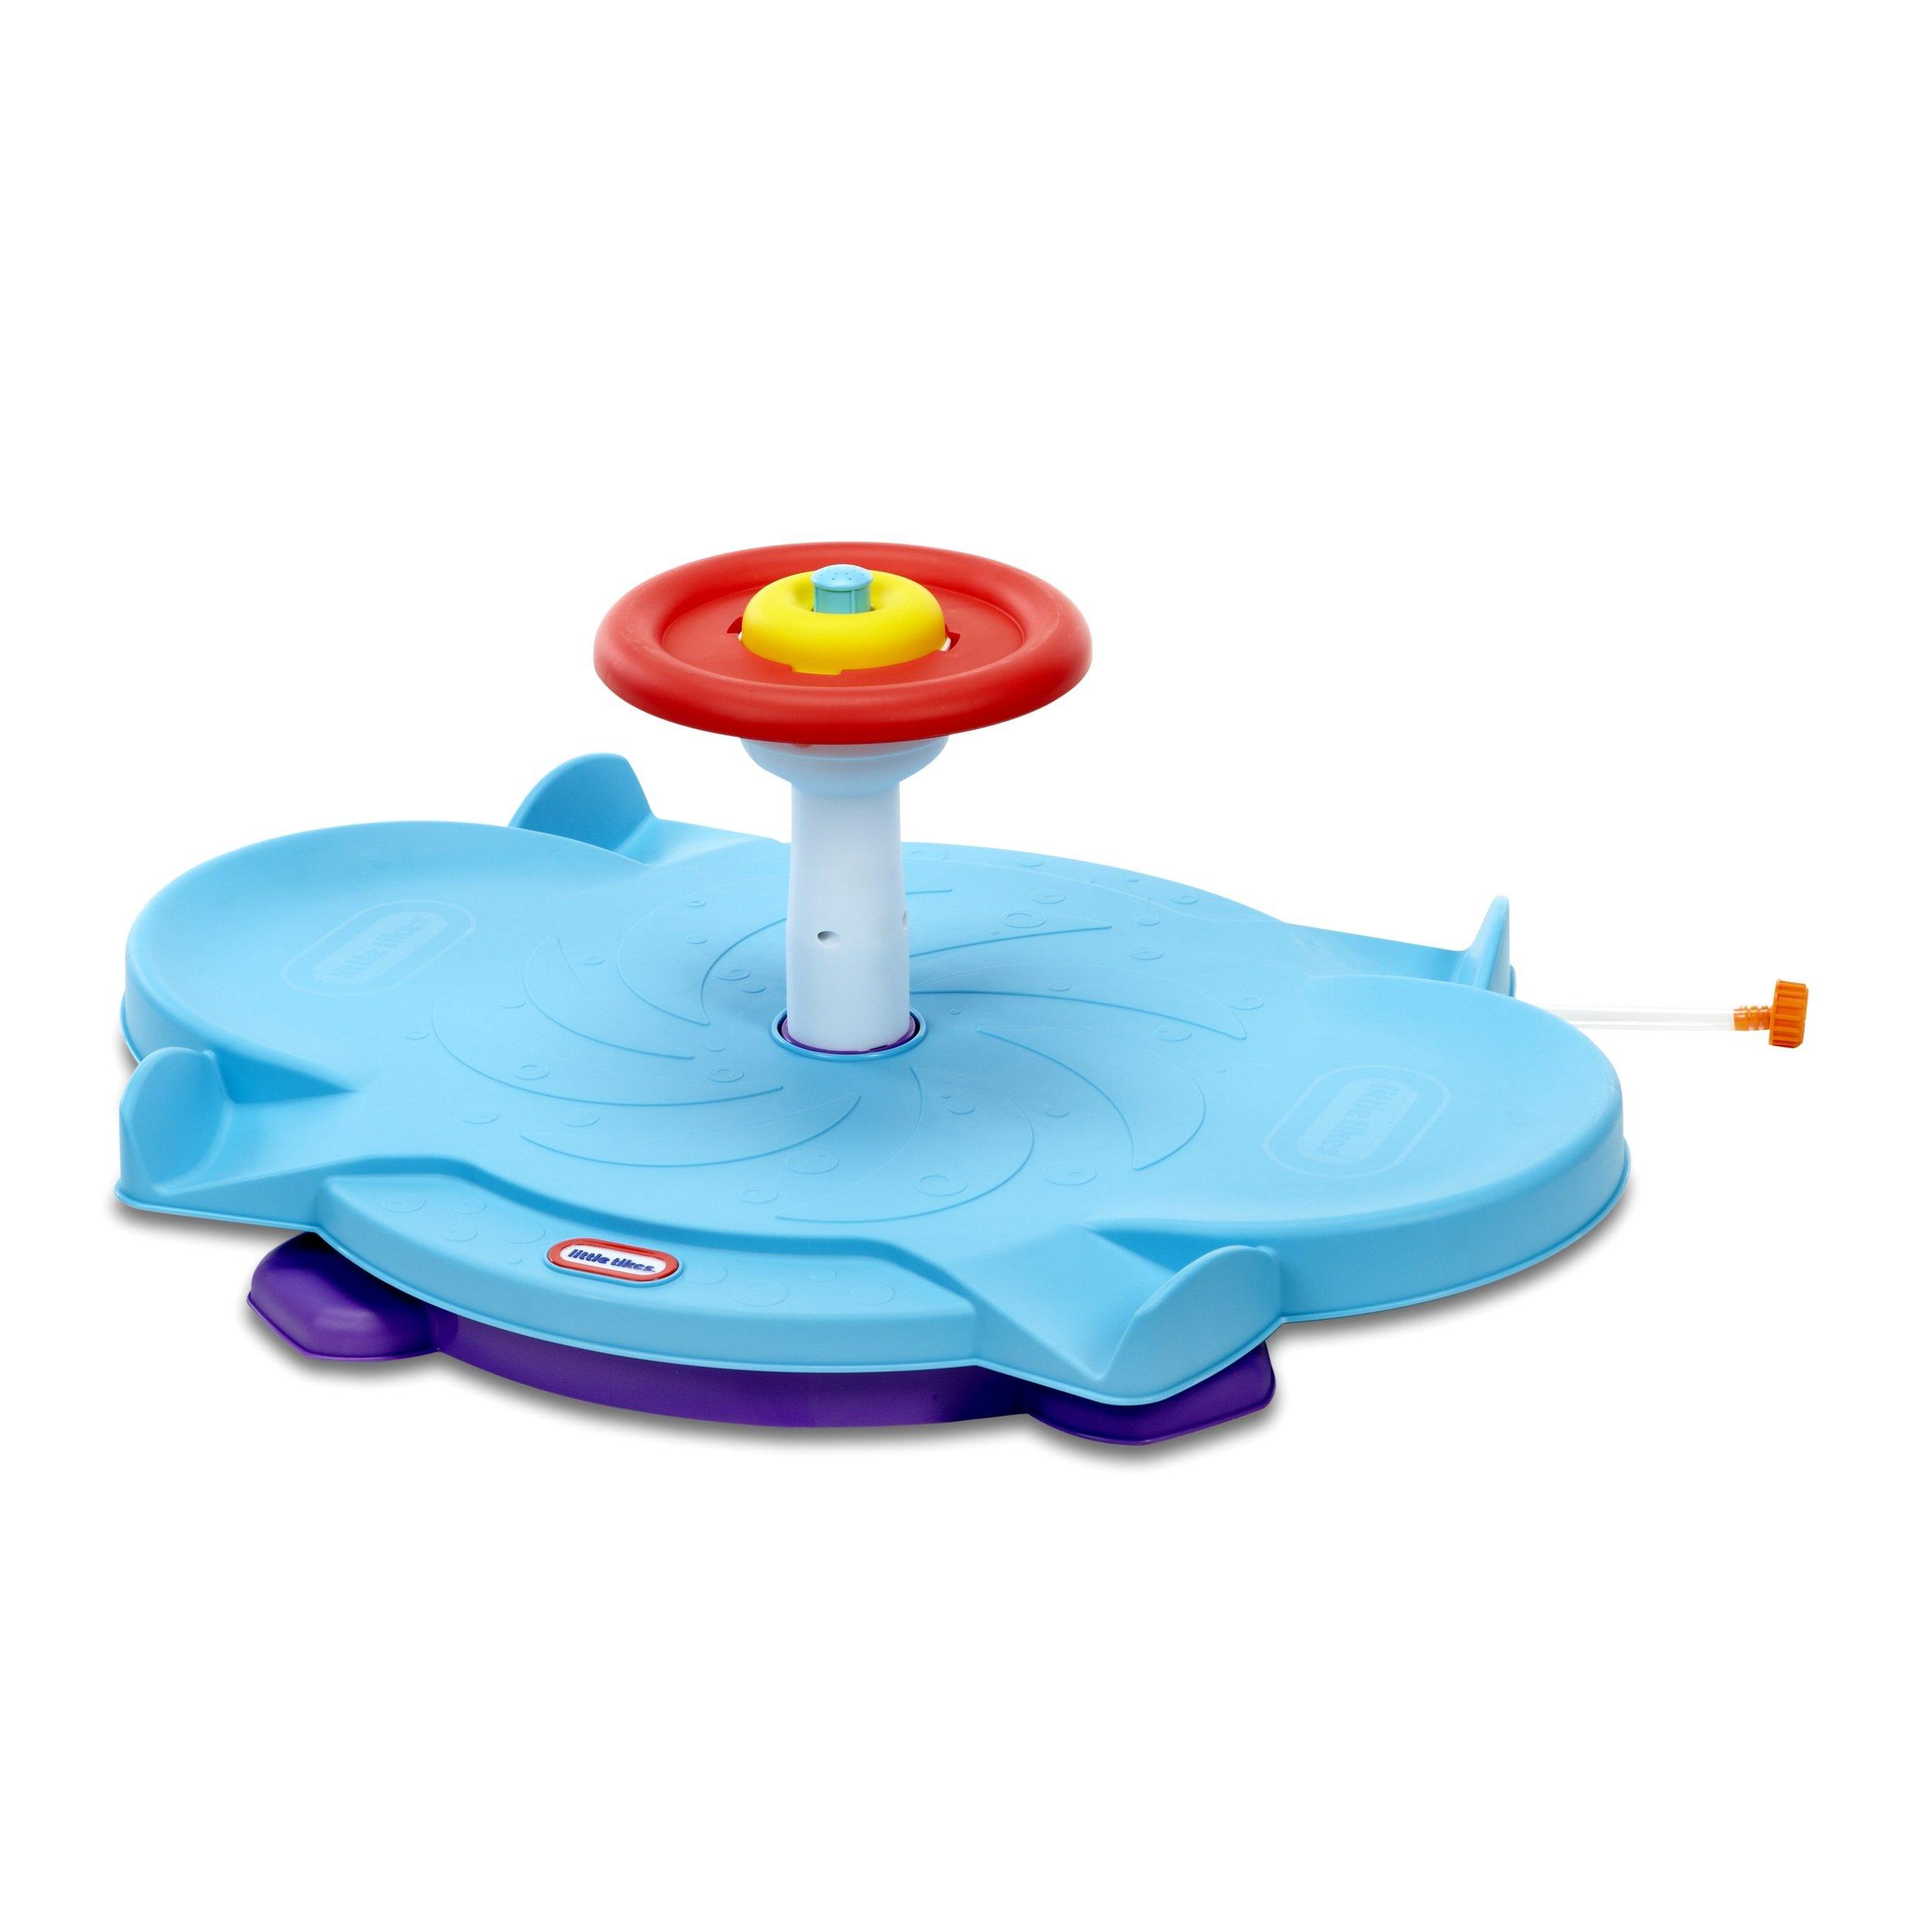 Little Tikes Fun Zone Dual Twister by Little Tikes